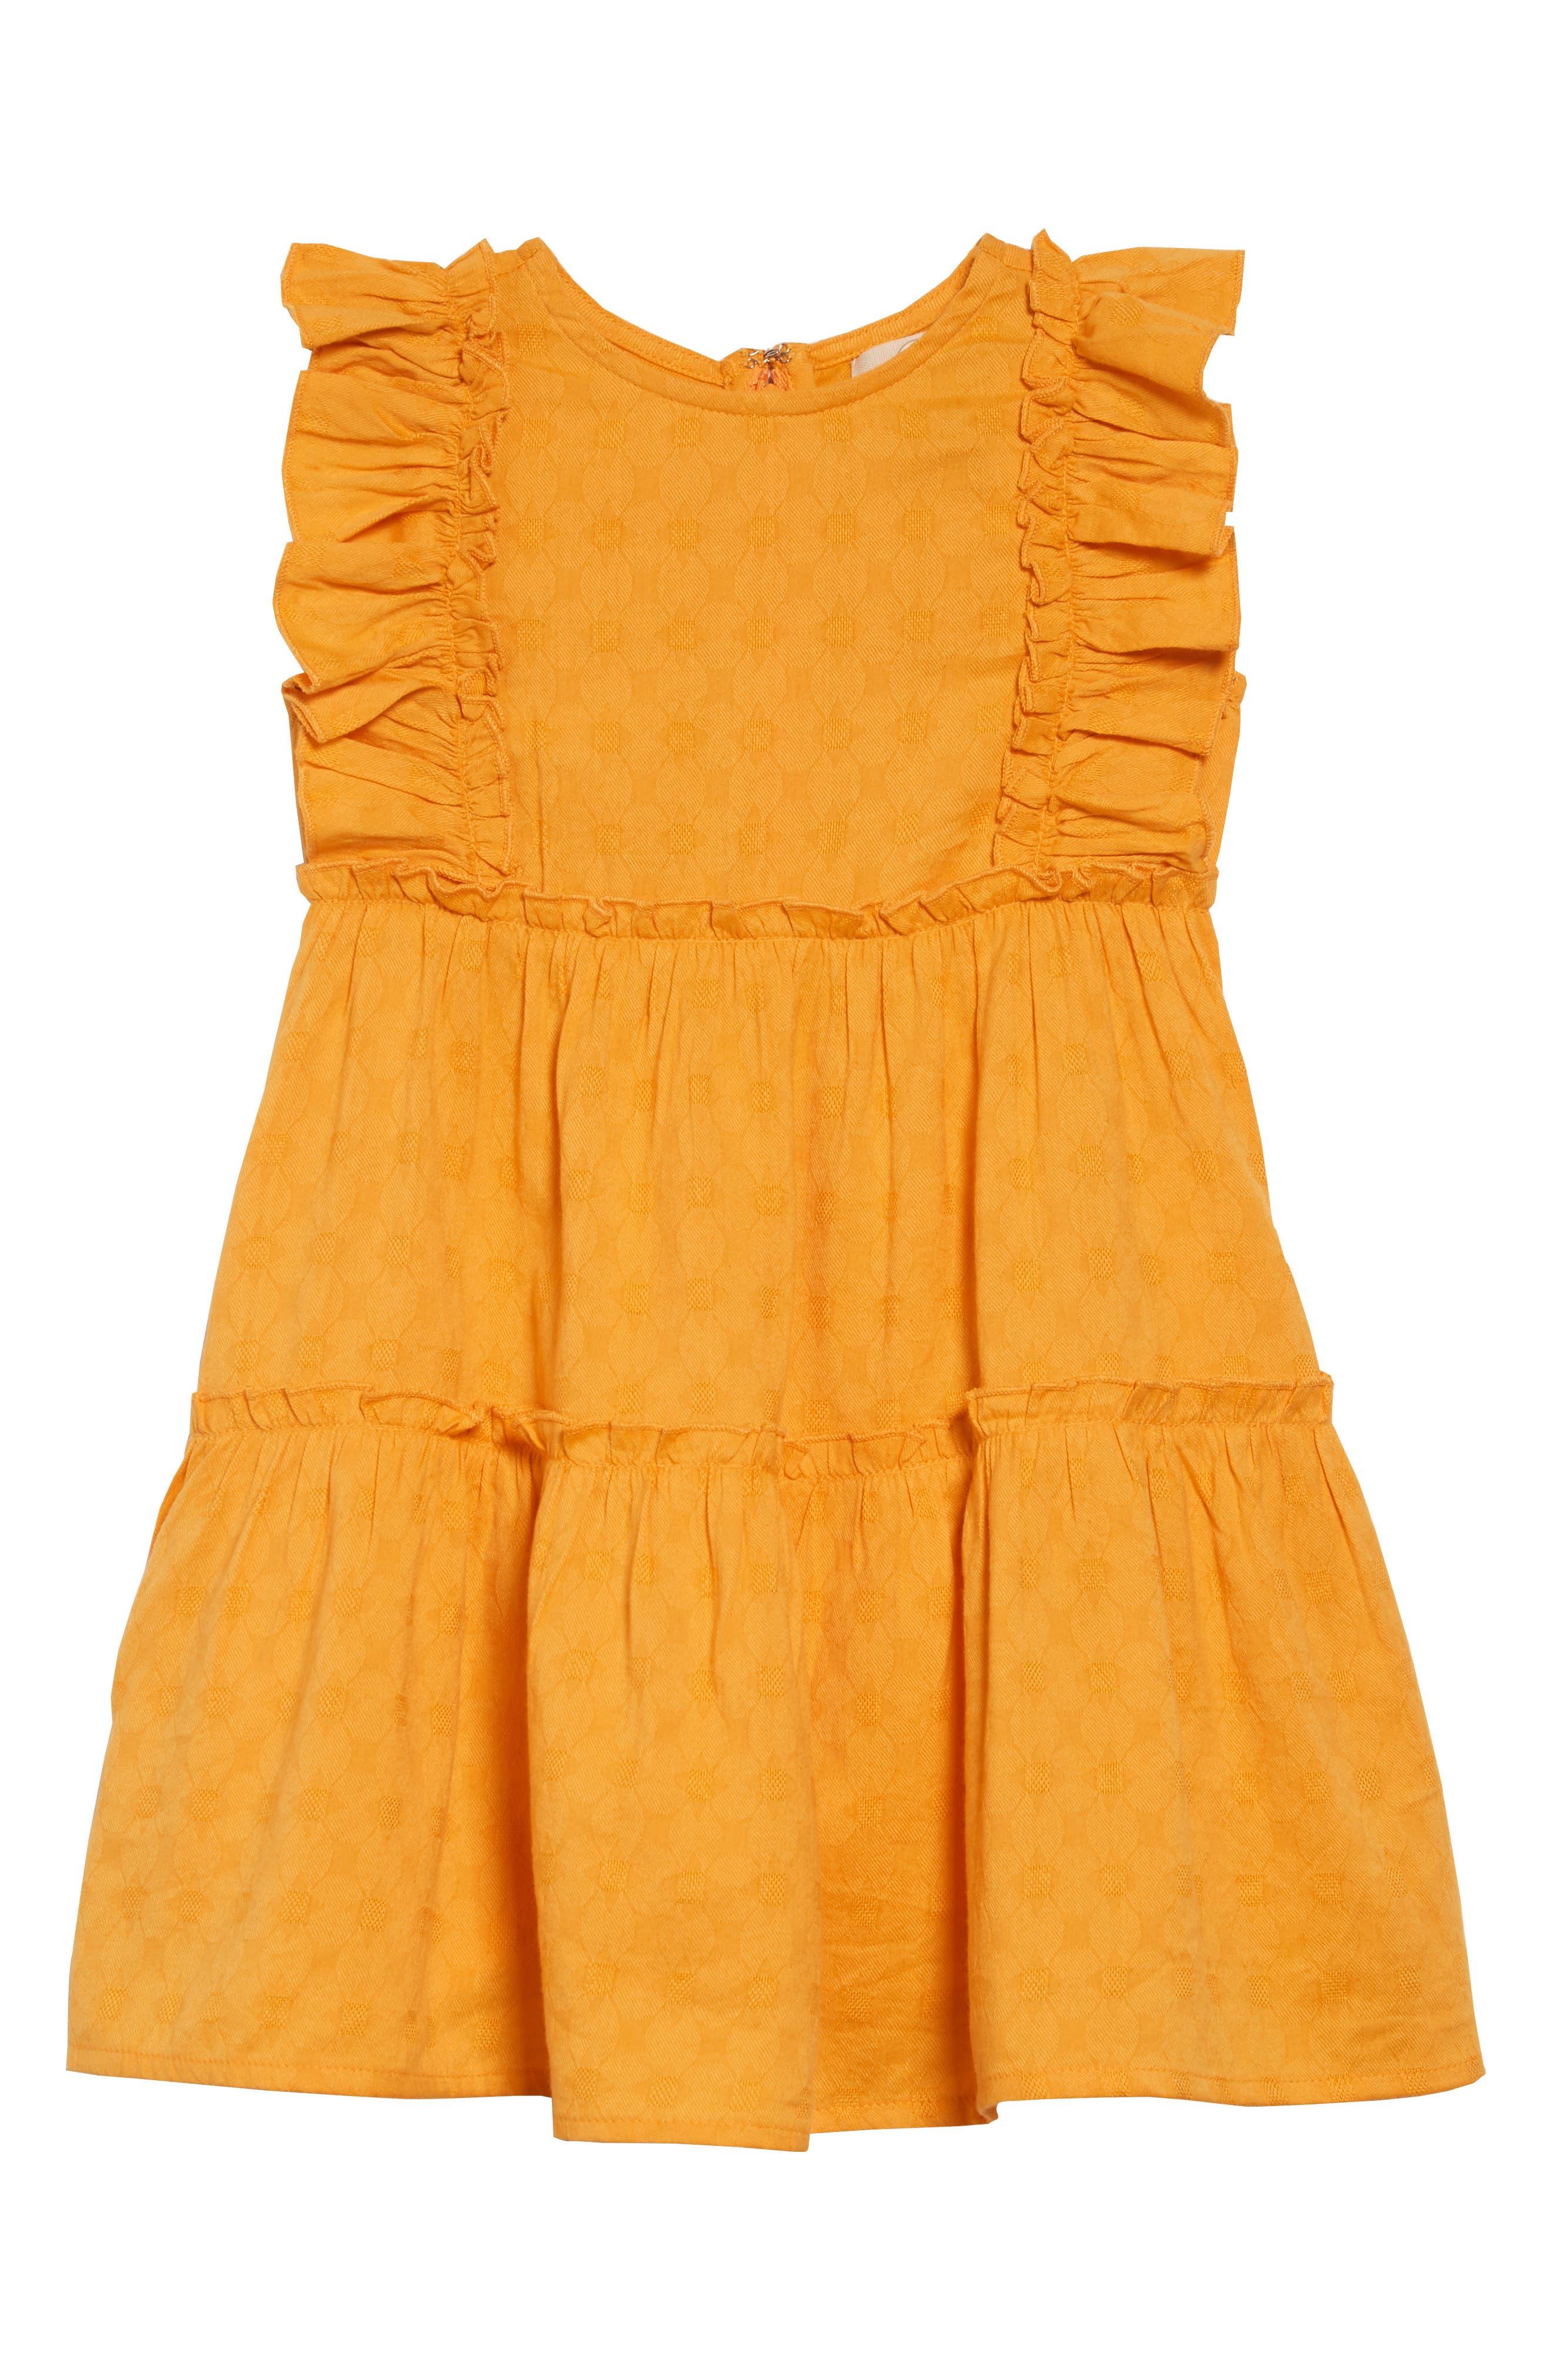 PEEK AREN'T YOU CURIOUS Angelica Ruffle Dress, Main, color, 700